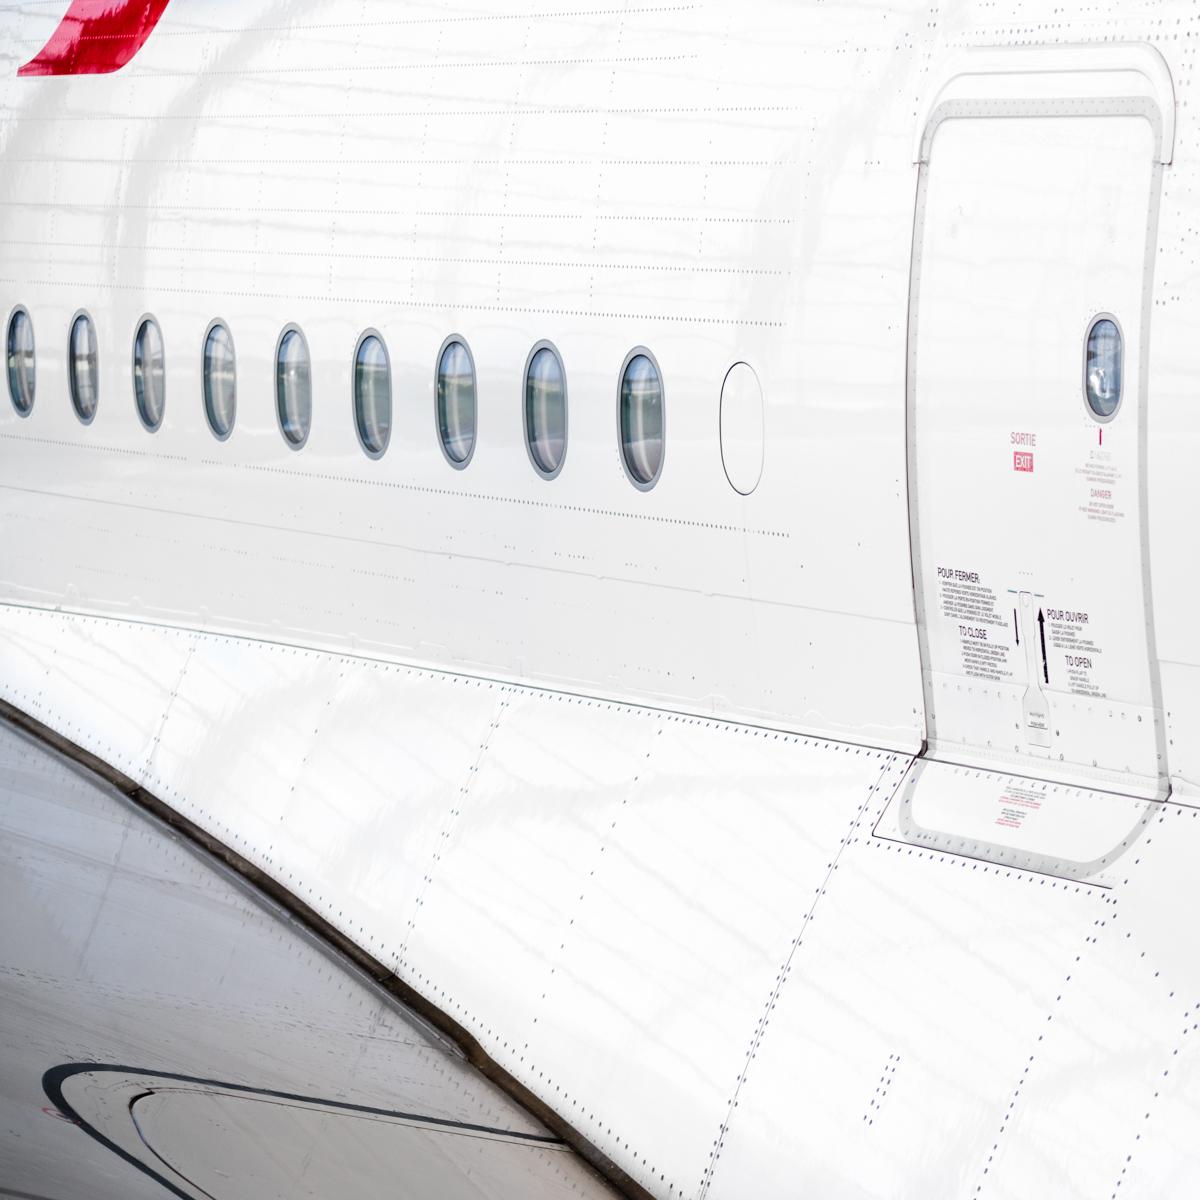 air france a380 door wing (1 of 1).jpg